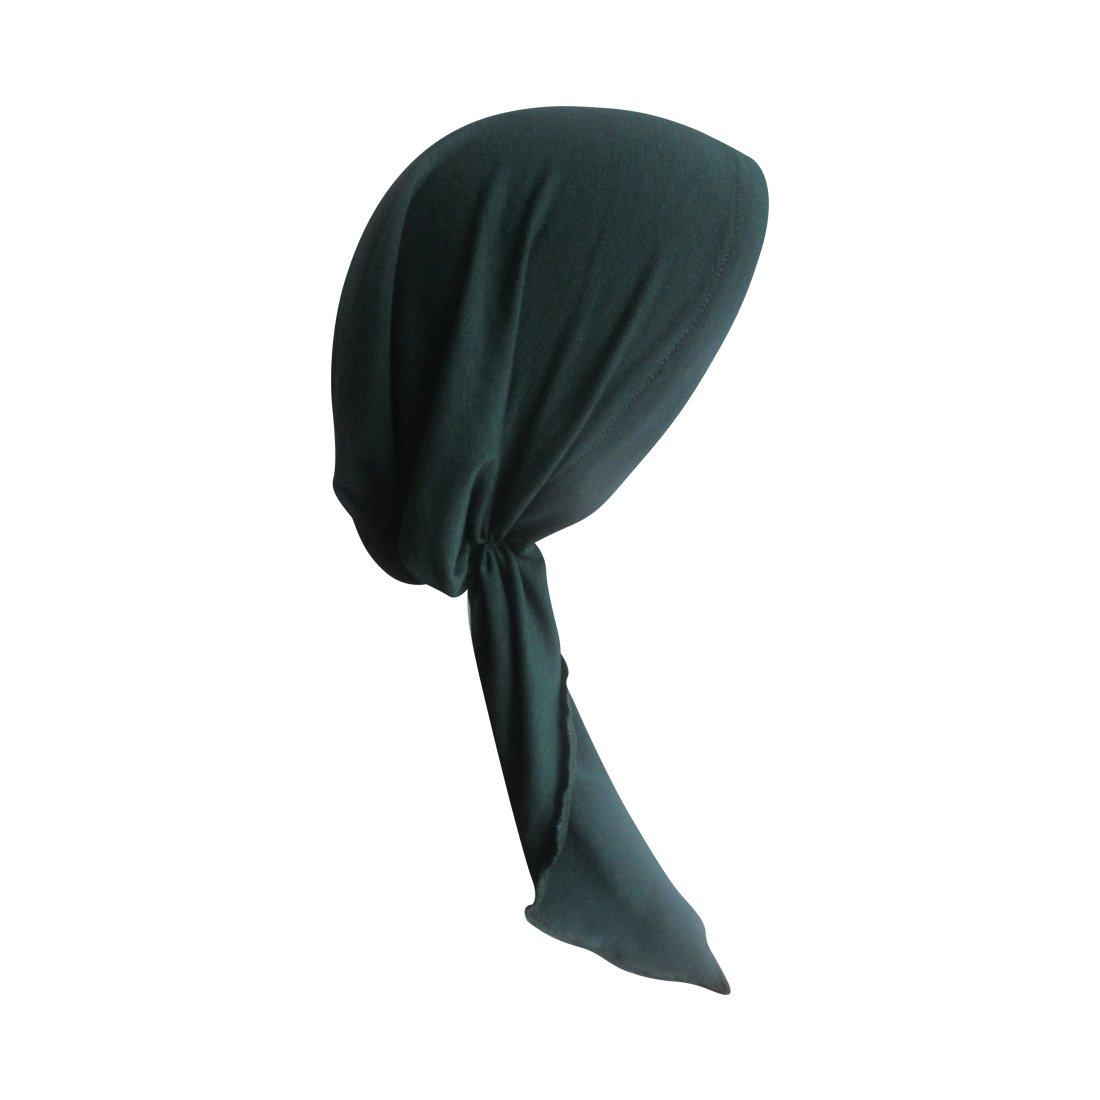 Dark Heather Grey Pretied Chemo Cap for Women Soft Cancer Scarf Landana Headscarves ldpt-solid-dkheathergrey